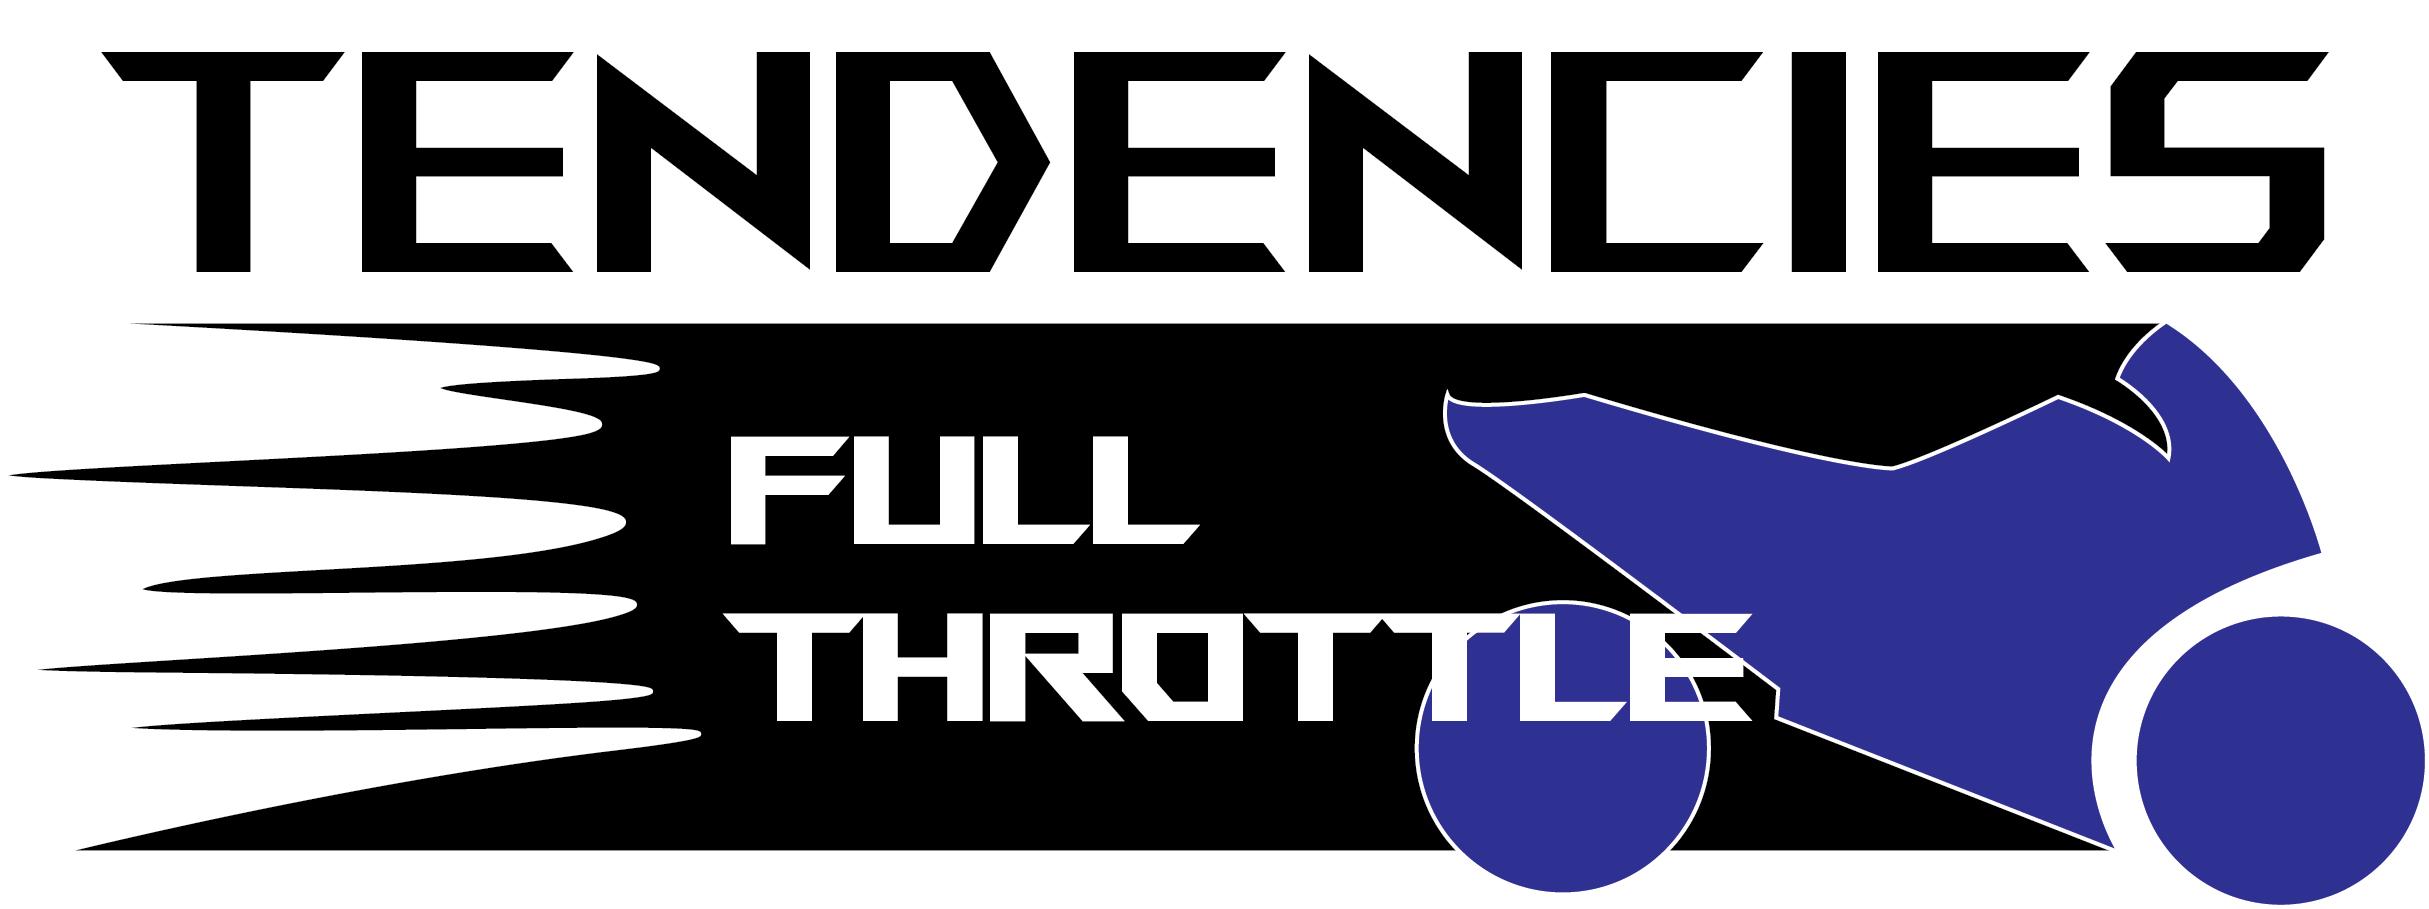 Tendencies: FULL THROTTLE